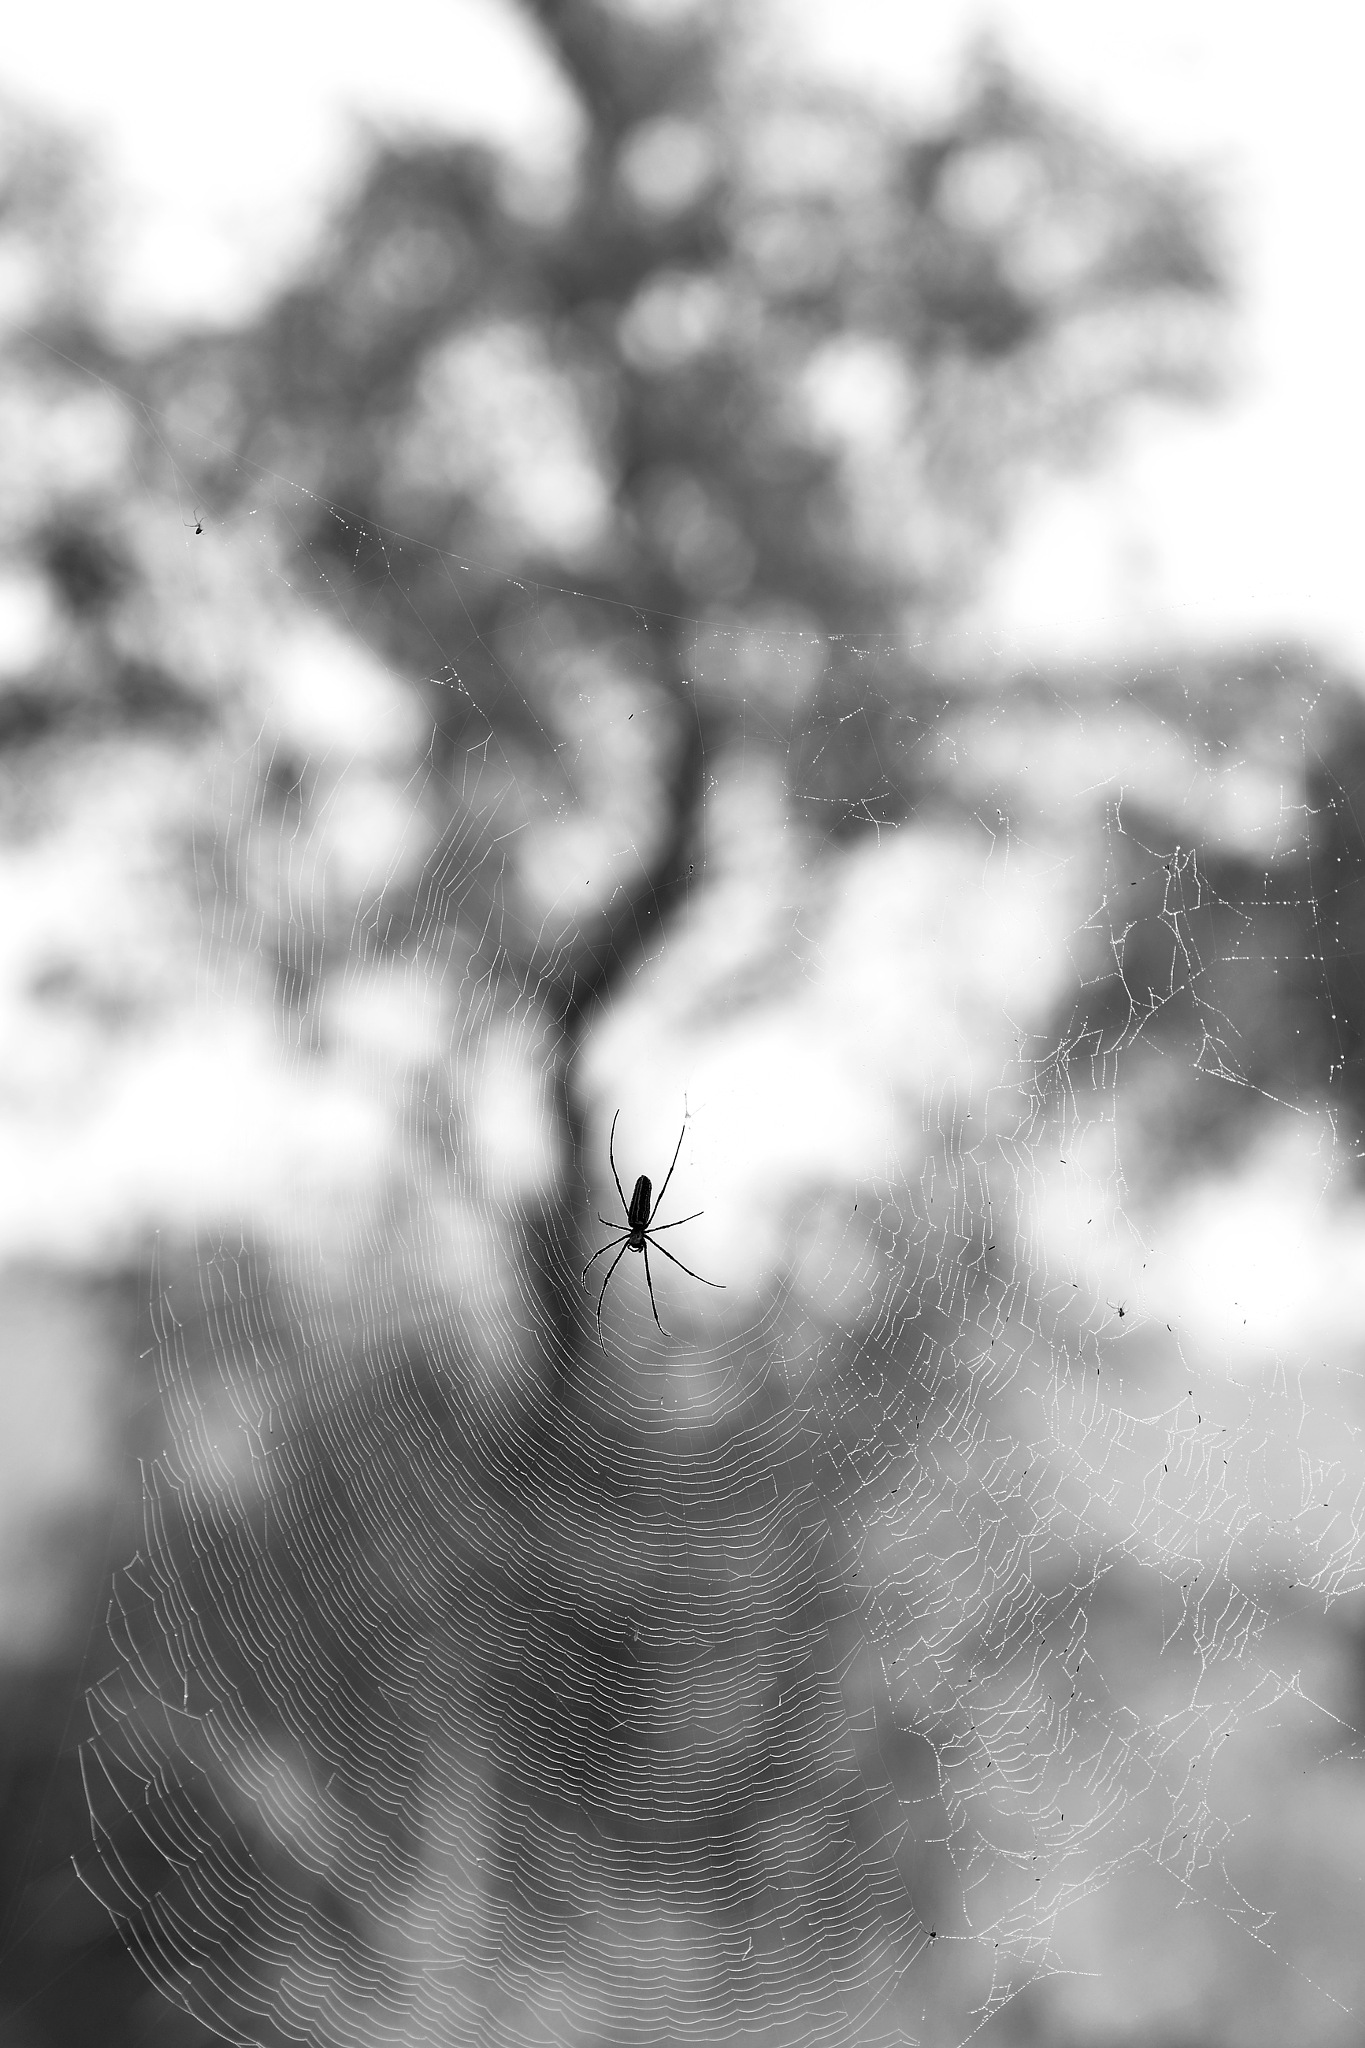 Miniature in the web. by SapnaAgrawal